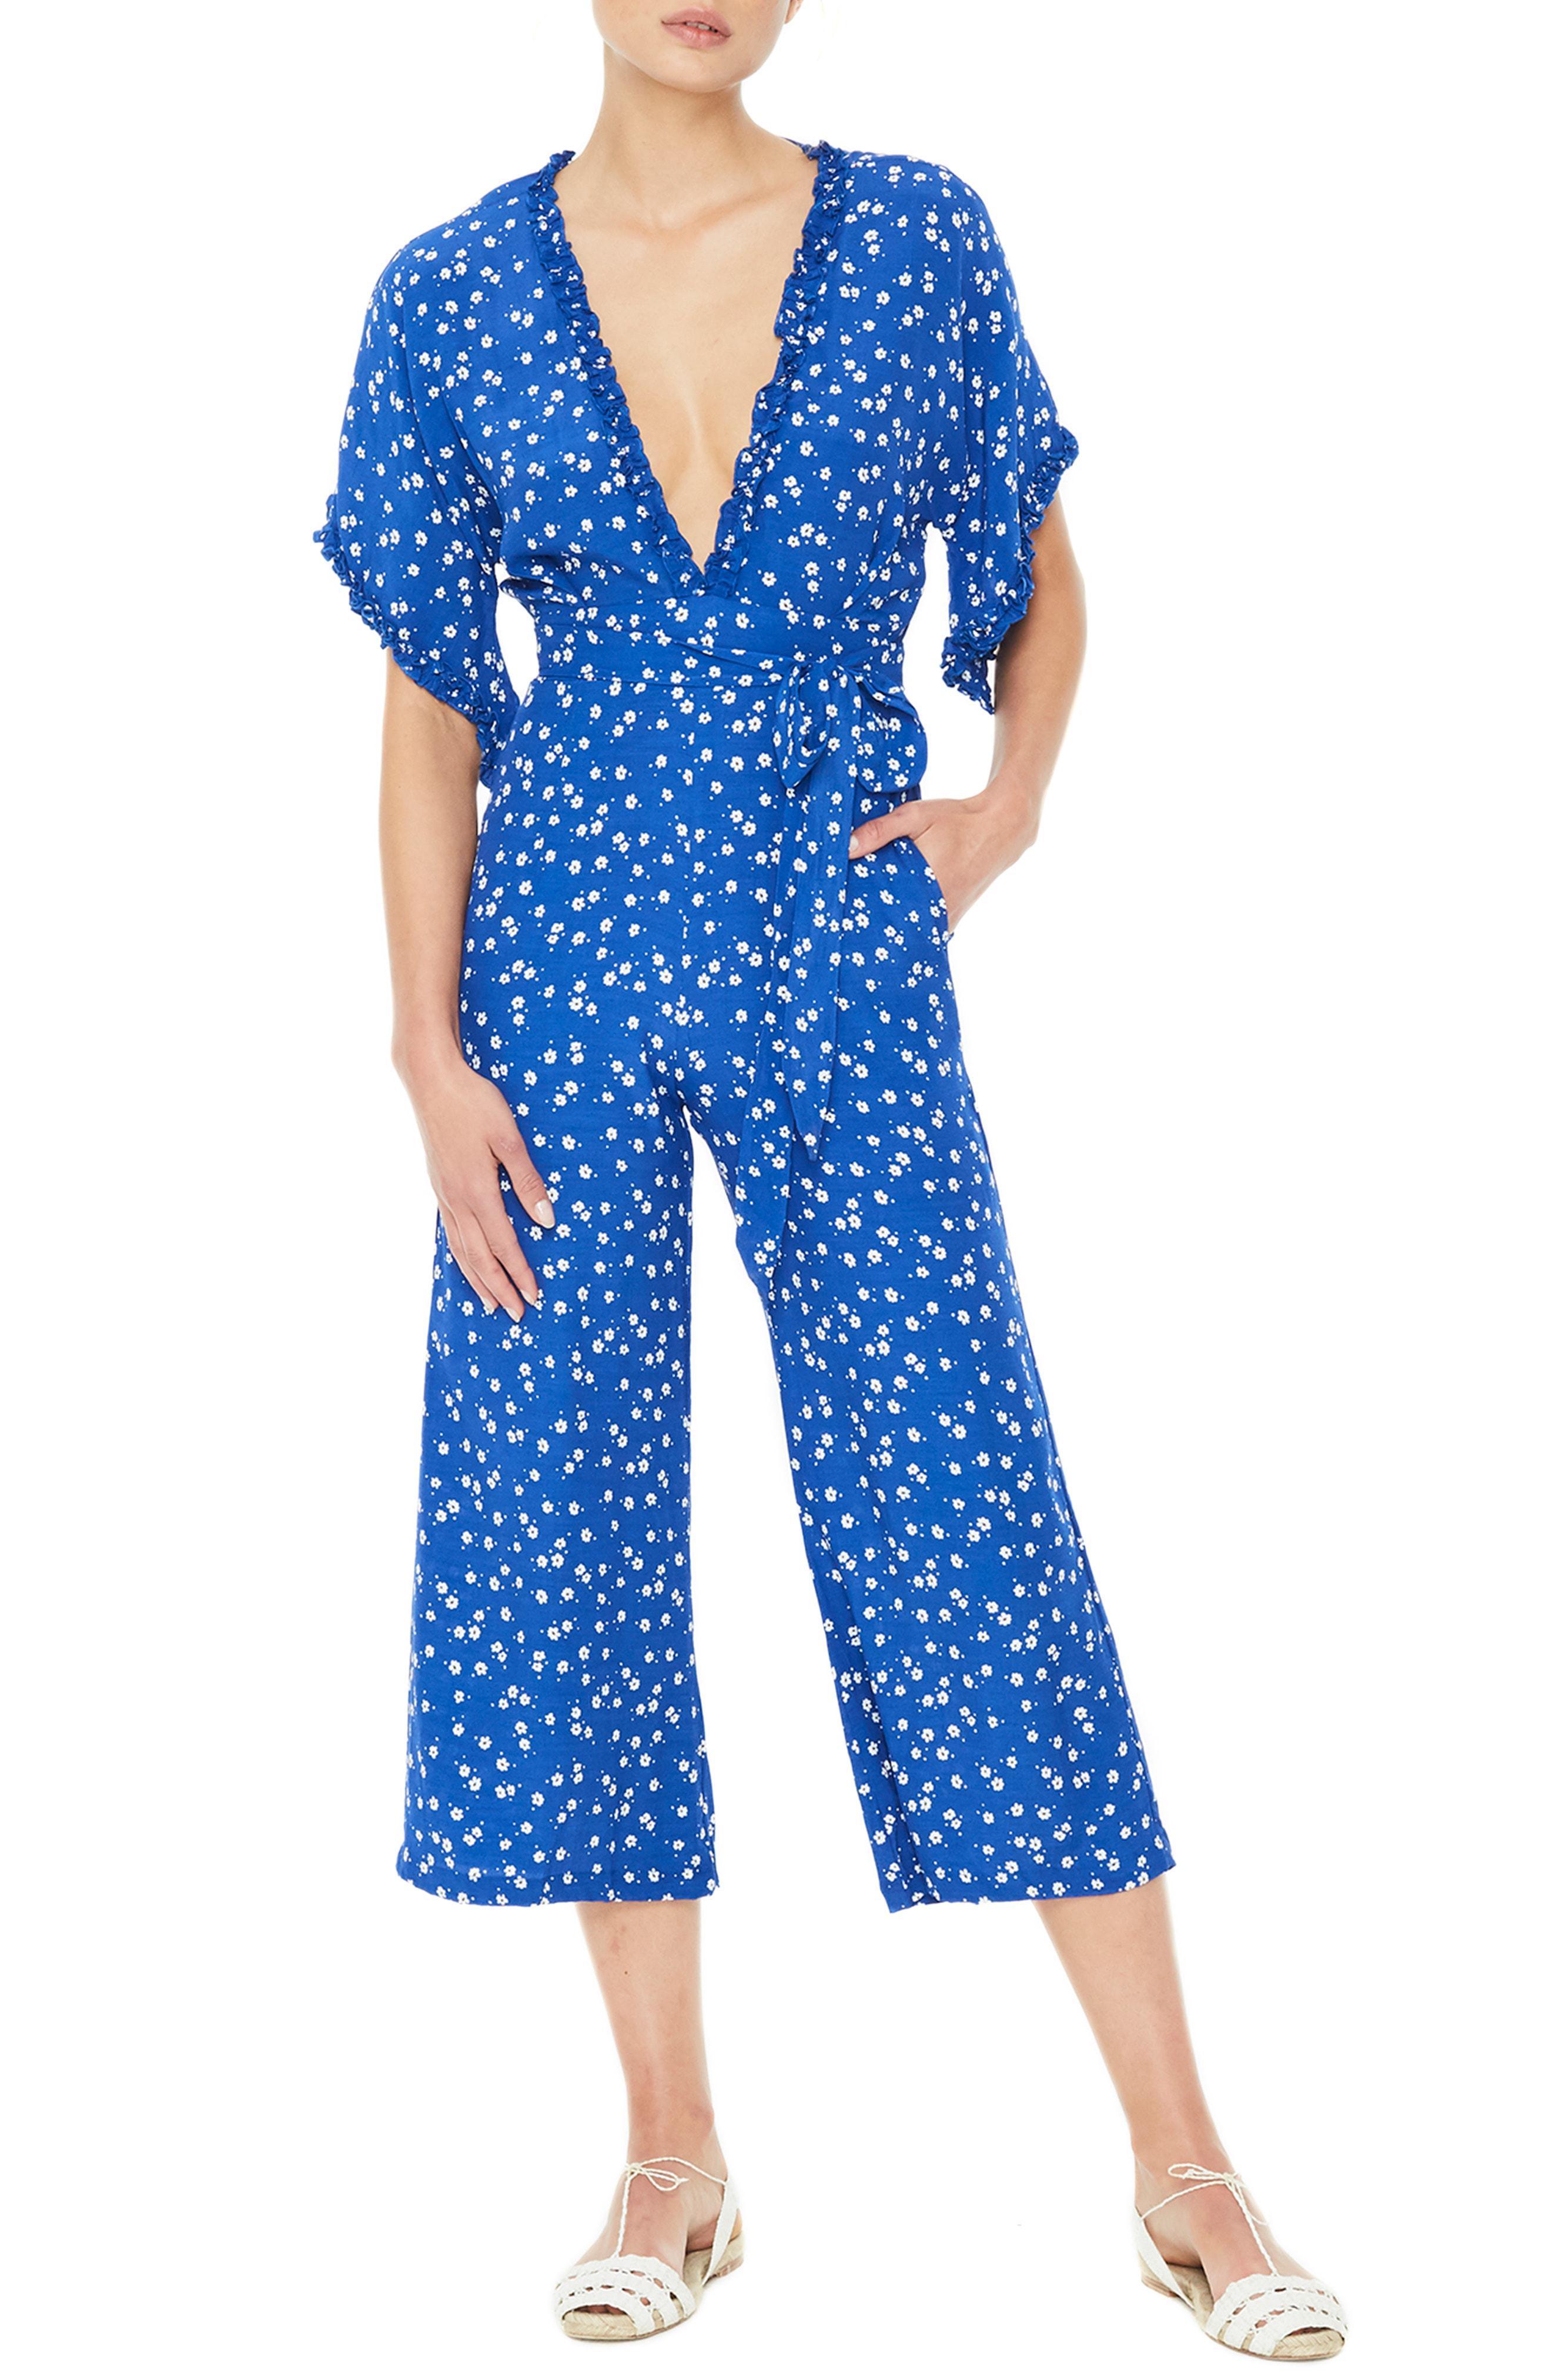 aea1a385201f Lyst - Faithfull The Brand La Villa Jumpsuit in Blue - Save 41%